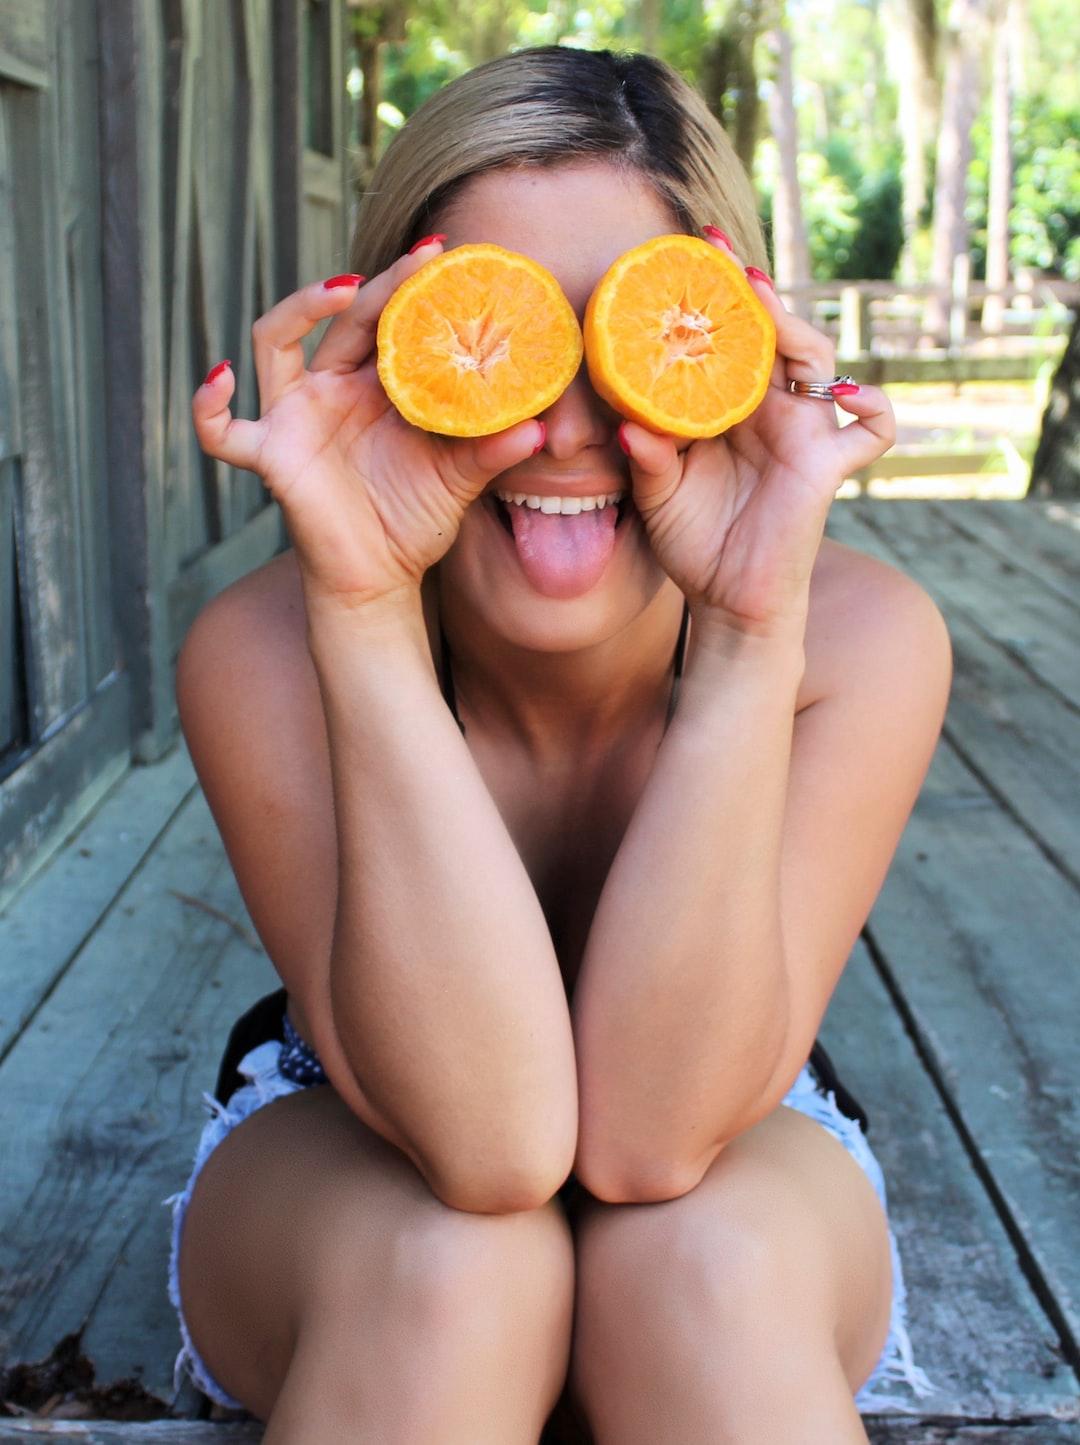 model posing with oranges